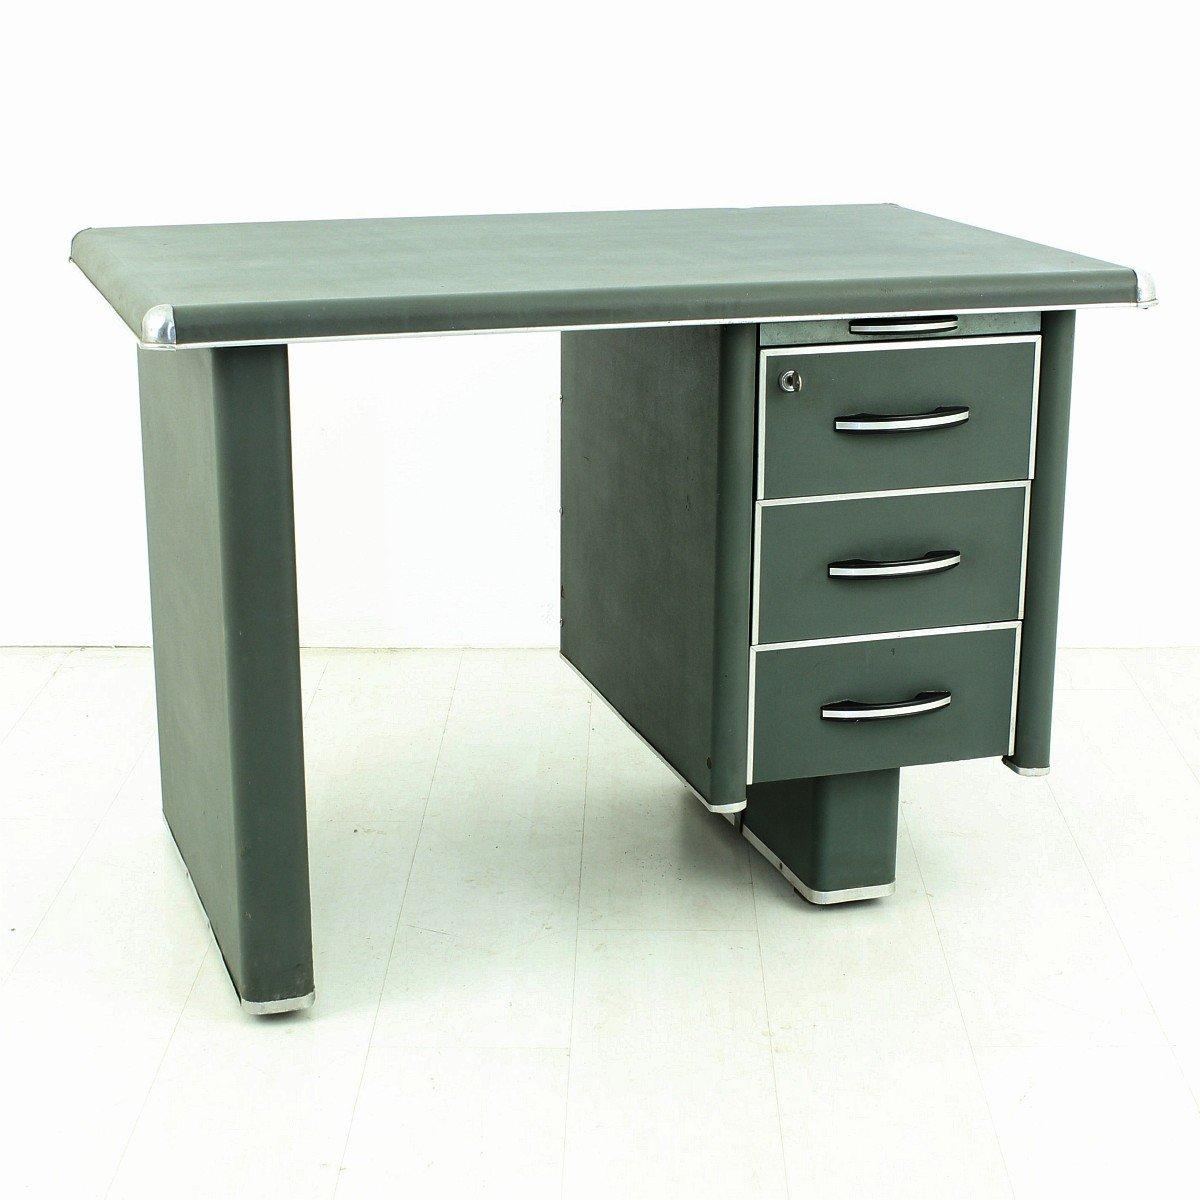 Vintage Metal Desk 1950s For Sale At Pamono